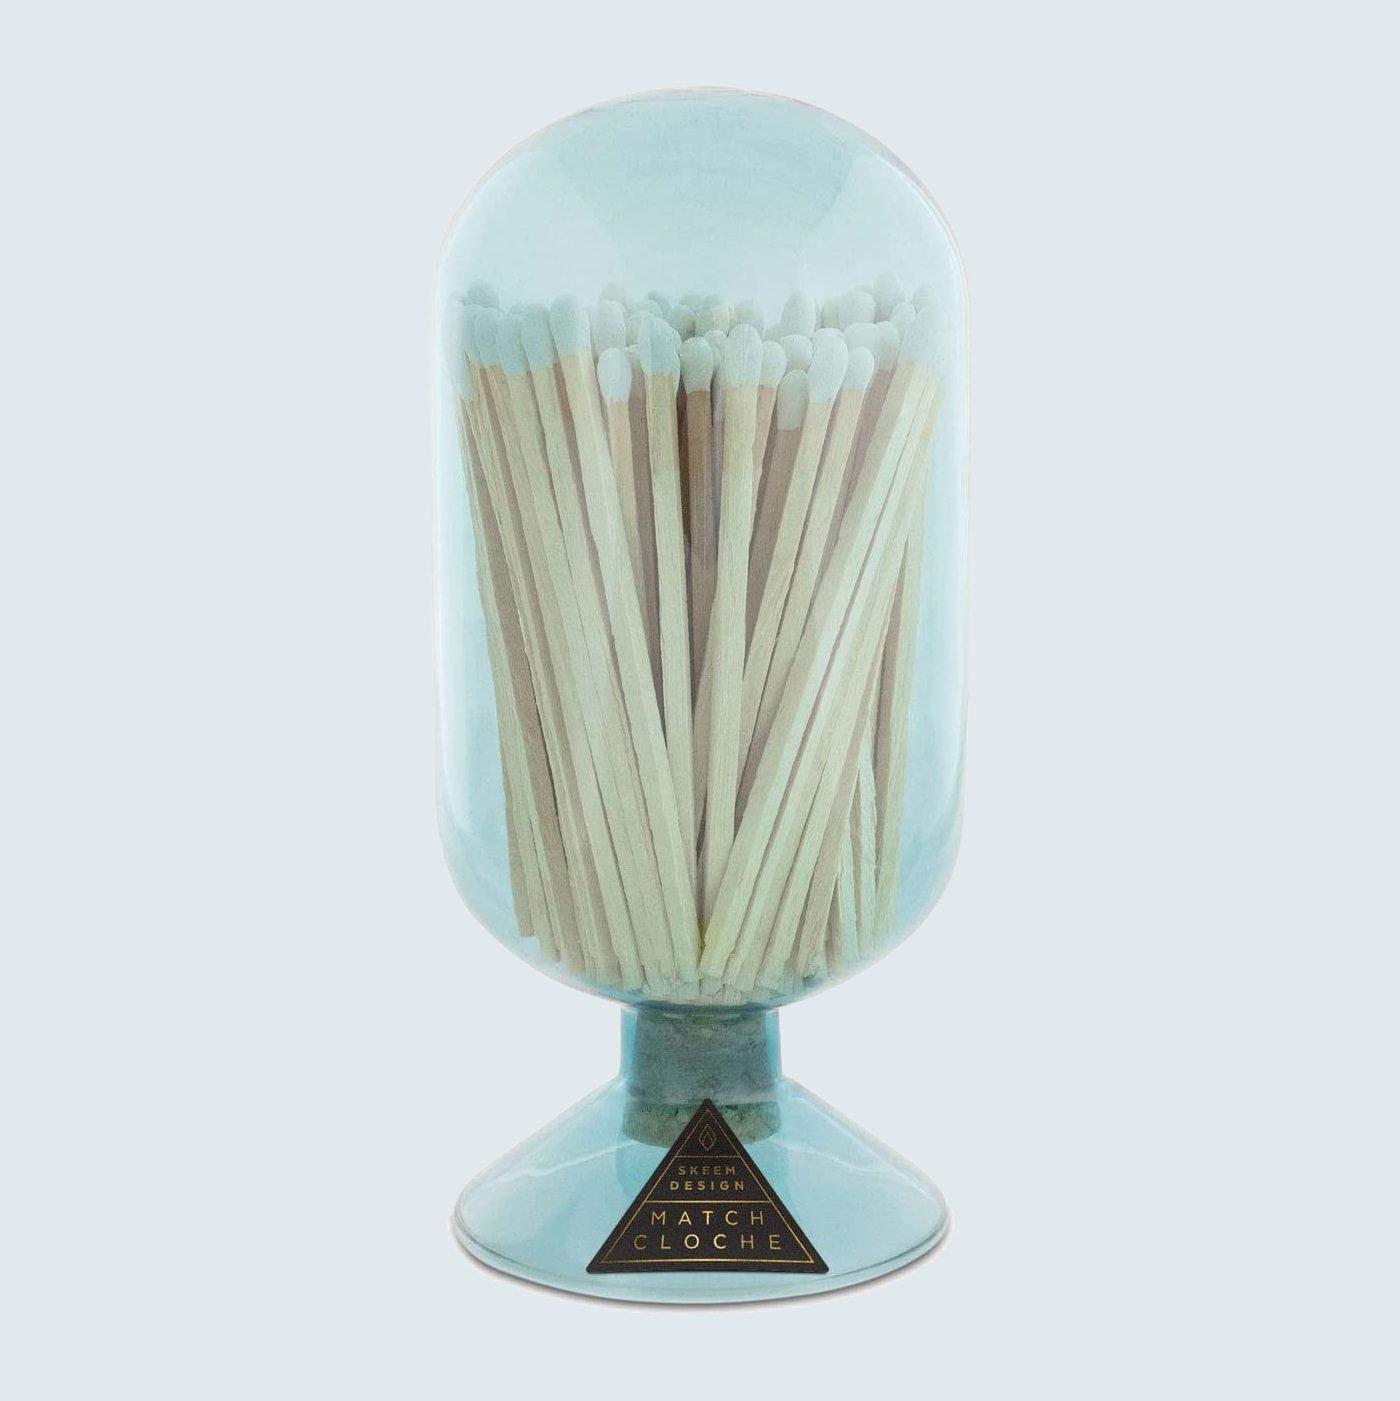 Skeem Design Handblown Glass Match Cloche